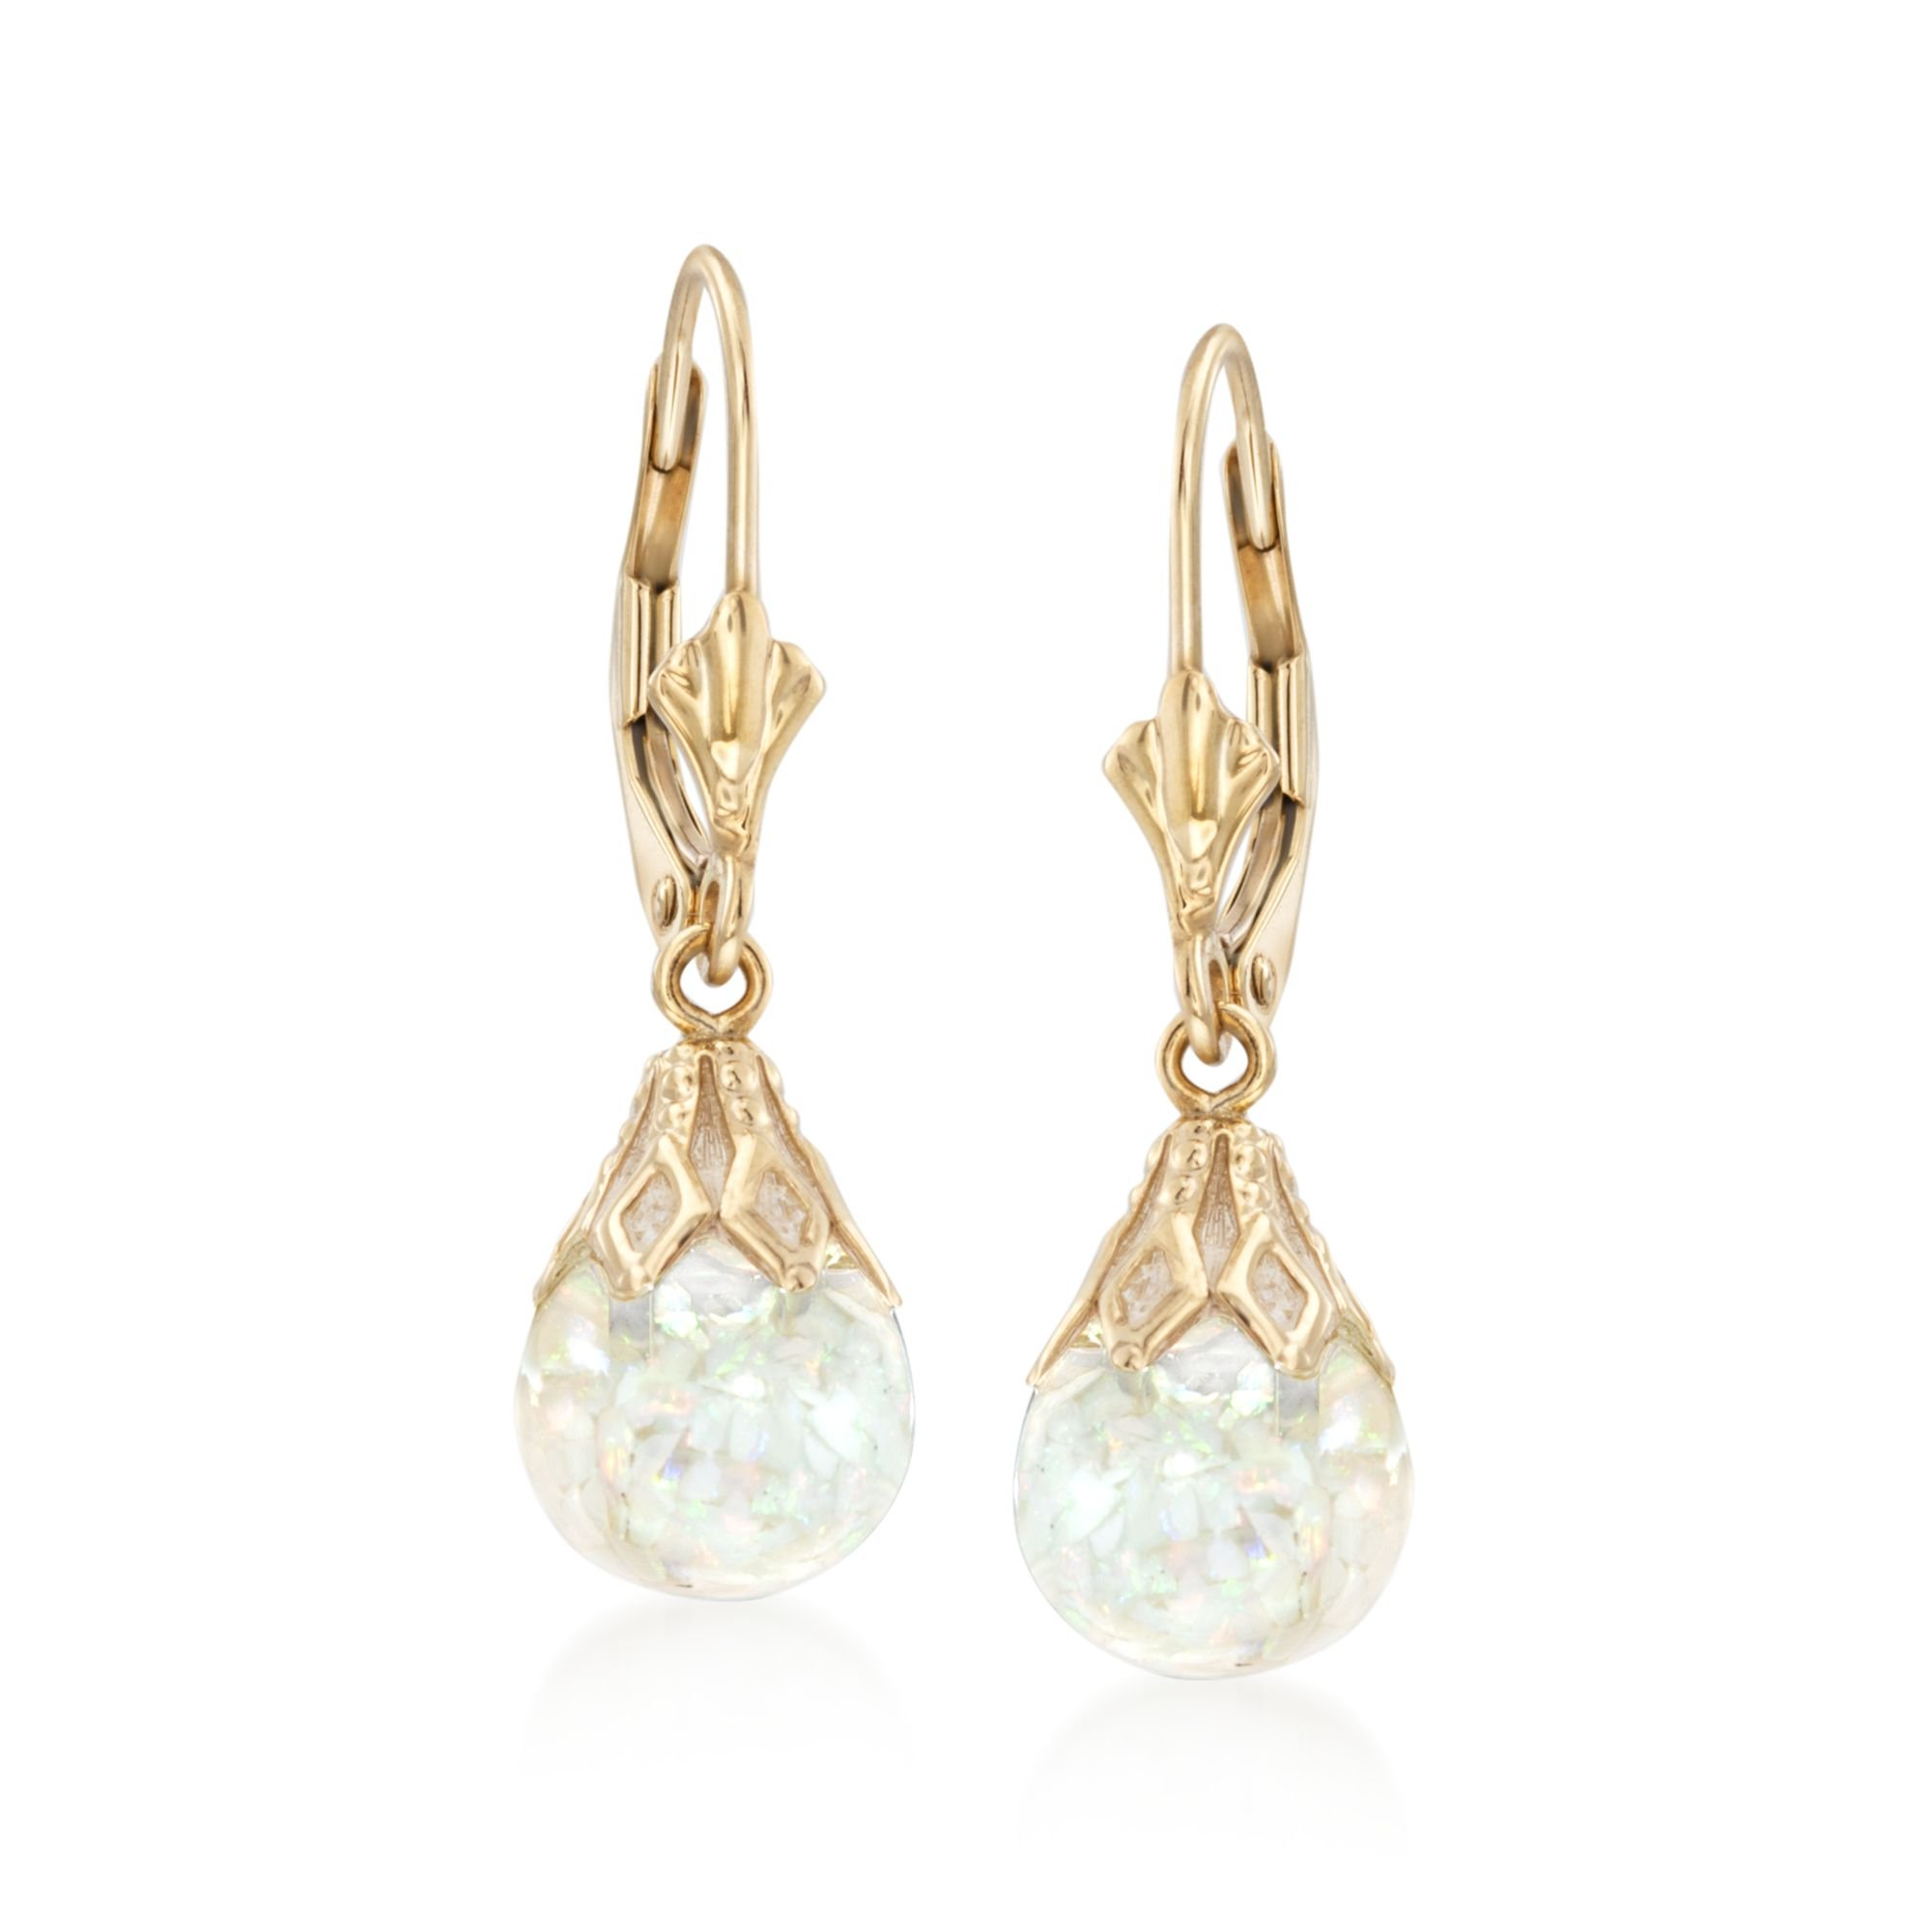 Ross-Simons Floating Opal Drop Earrings in 14kt Yellow Gold by Ross-Simons